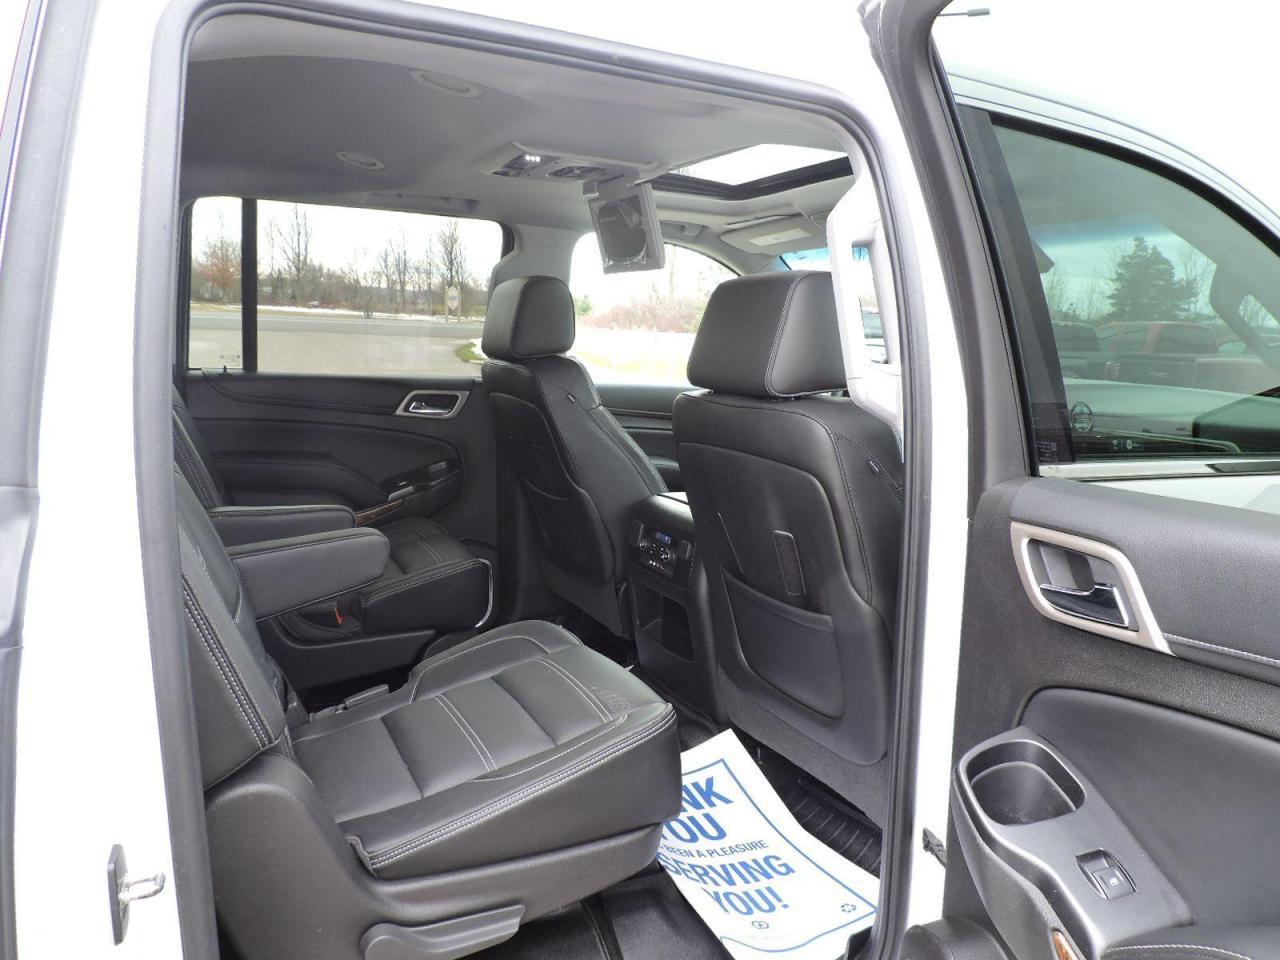 2016 GMC Yukon Denali XL